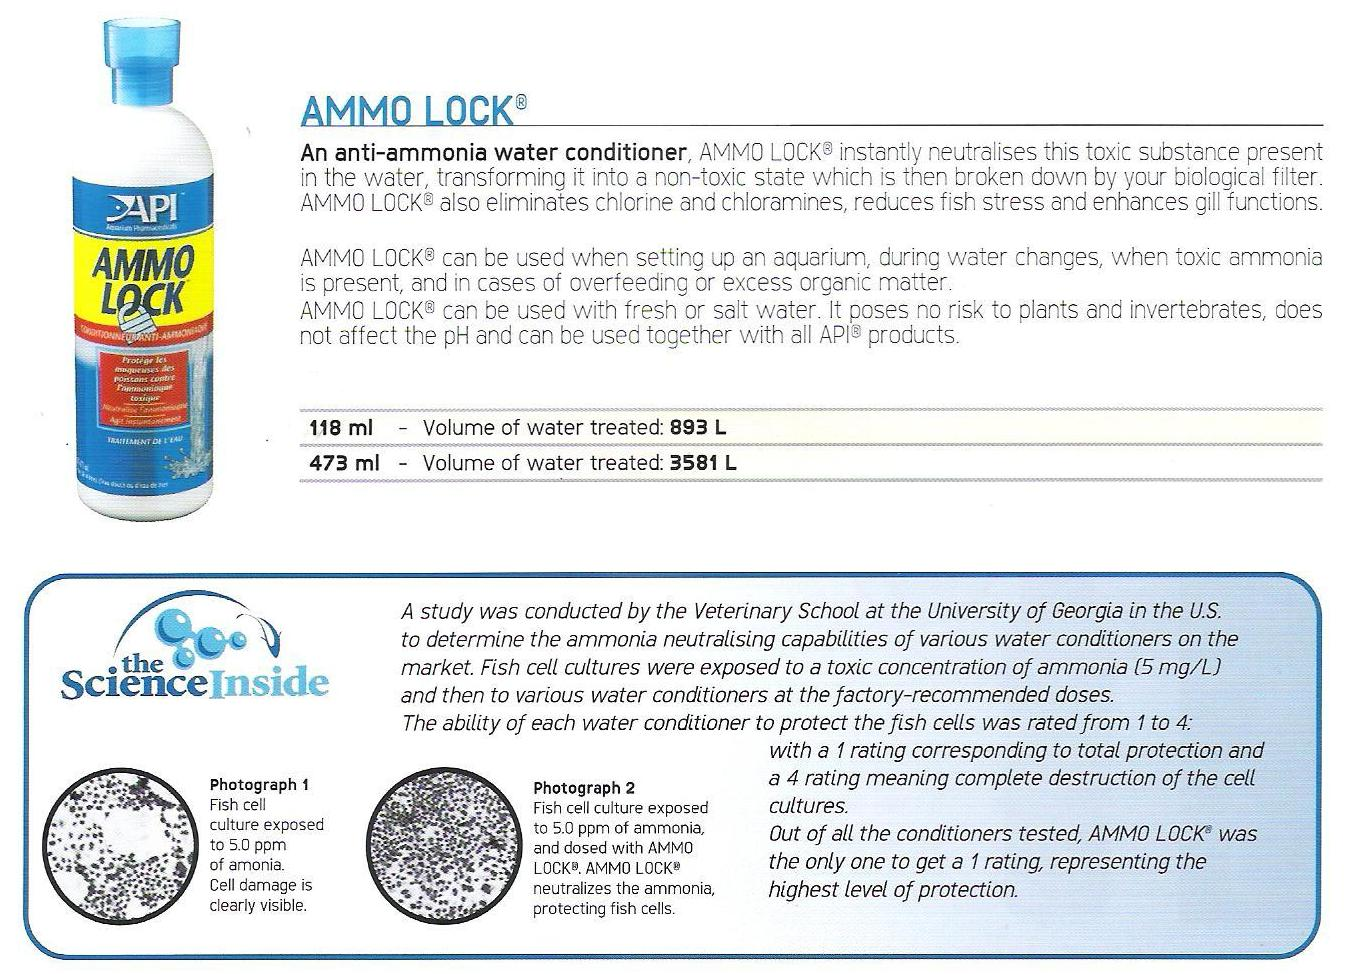 AP -AMMO LOCK